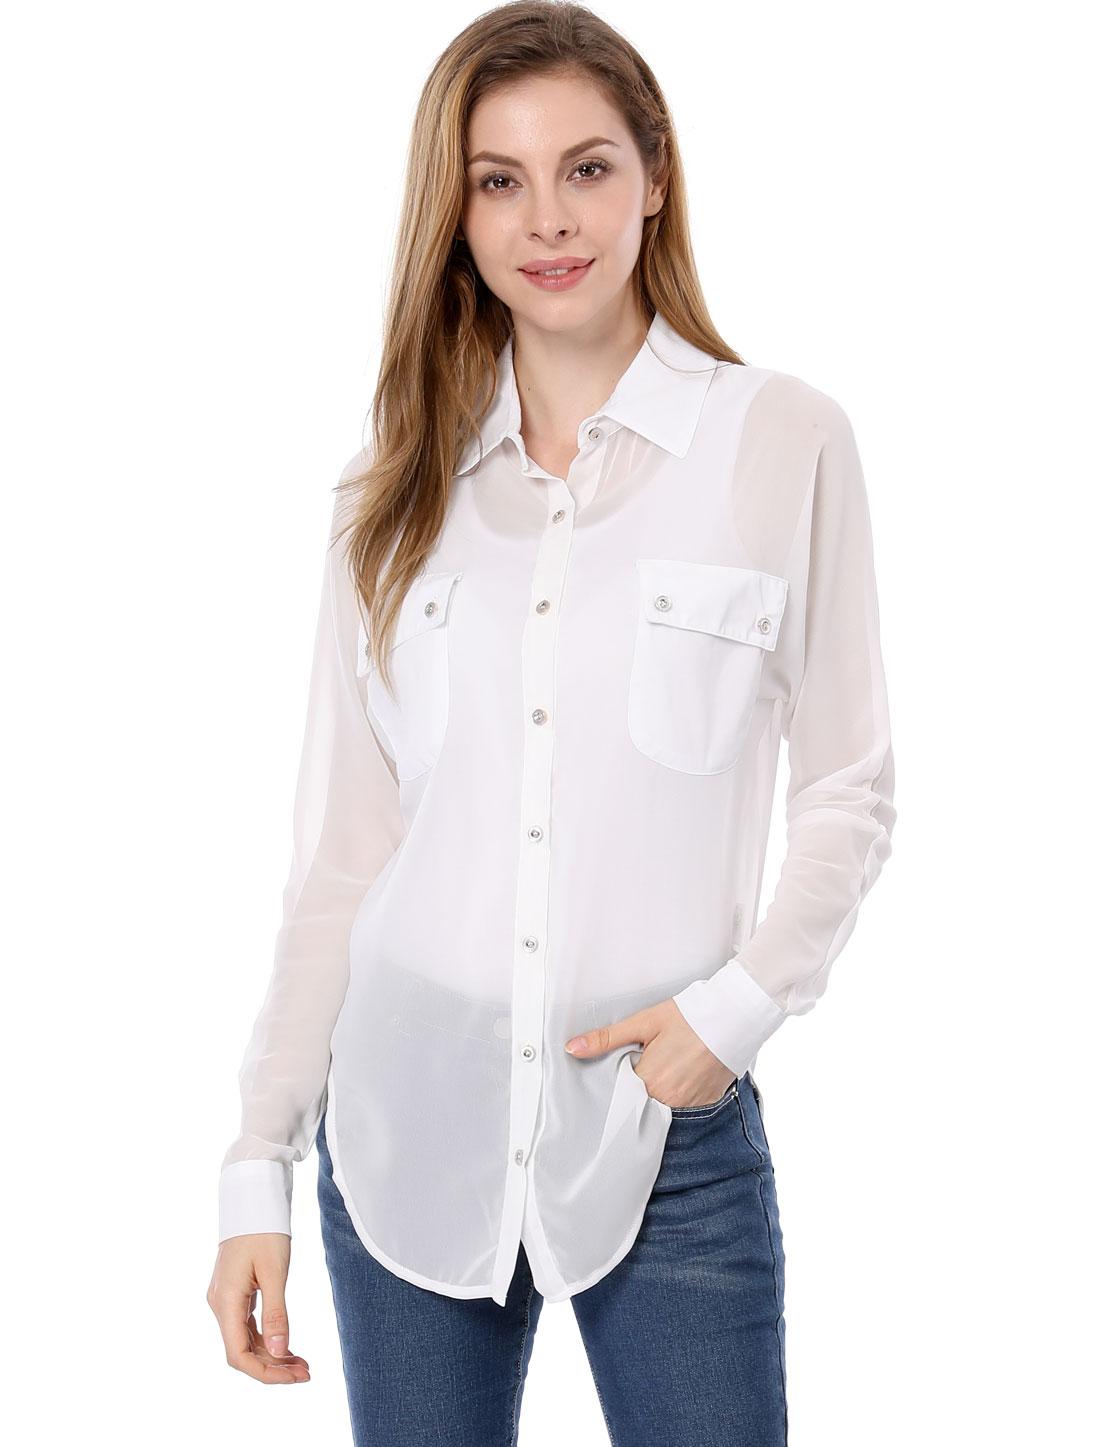 Women Casual Bust Pockets Long Dolman Sleeves Tunic Chiffon Top Shirt White XL